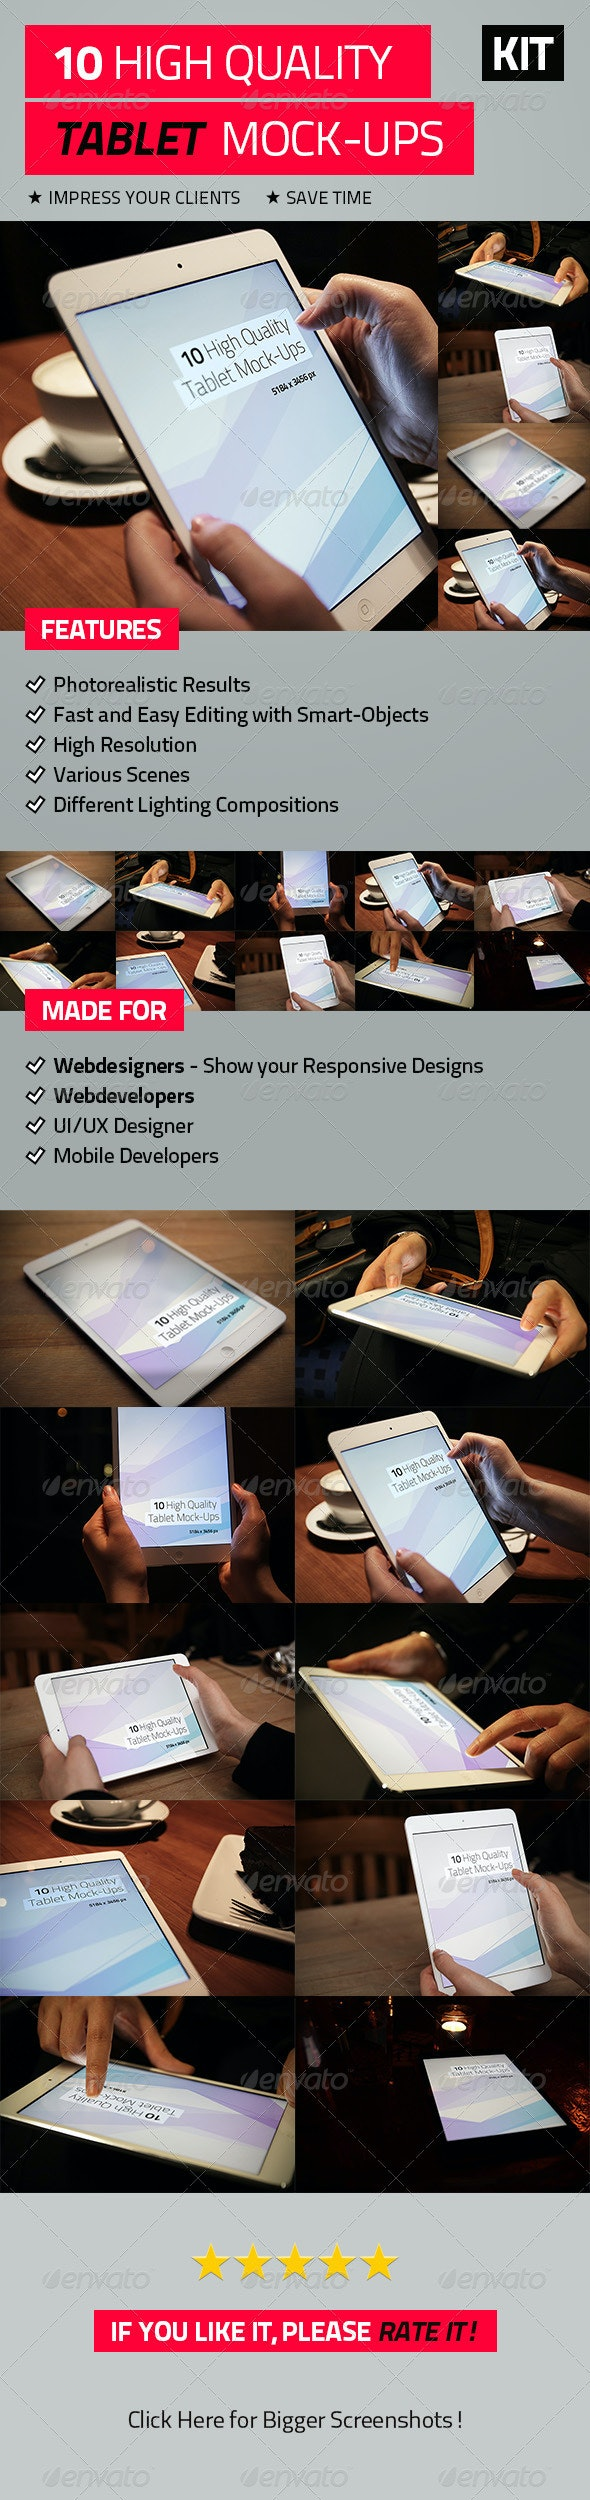 10 High Quality Tablet Mock-Ups - Mobile Displays